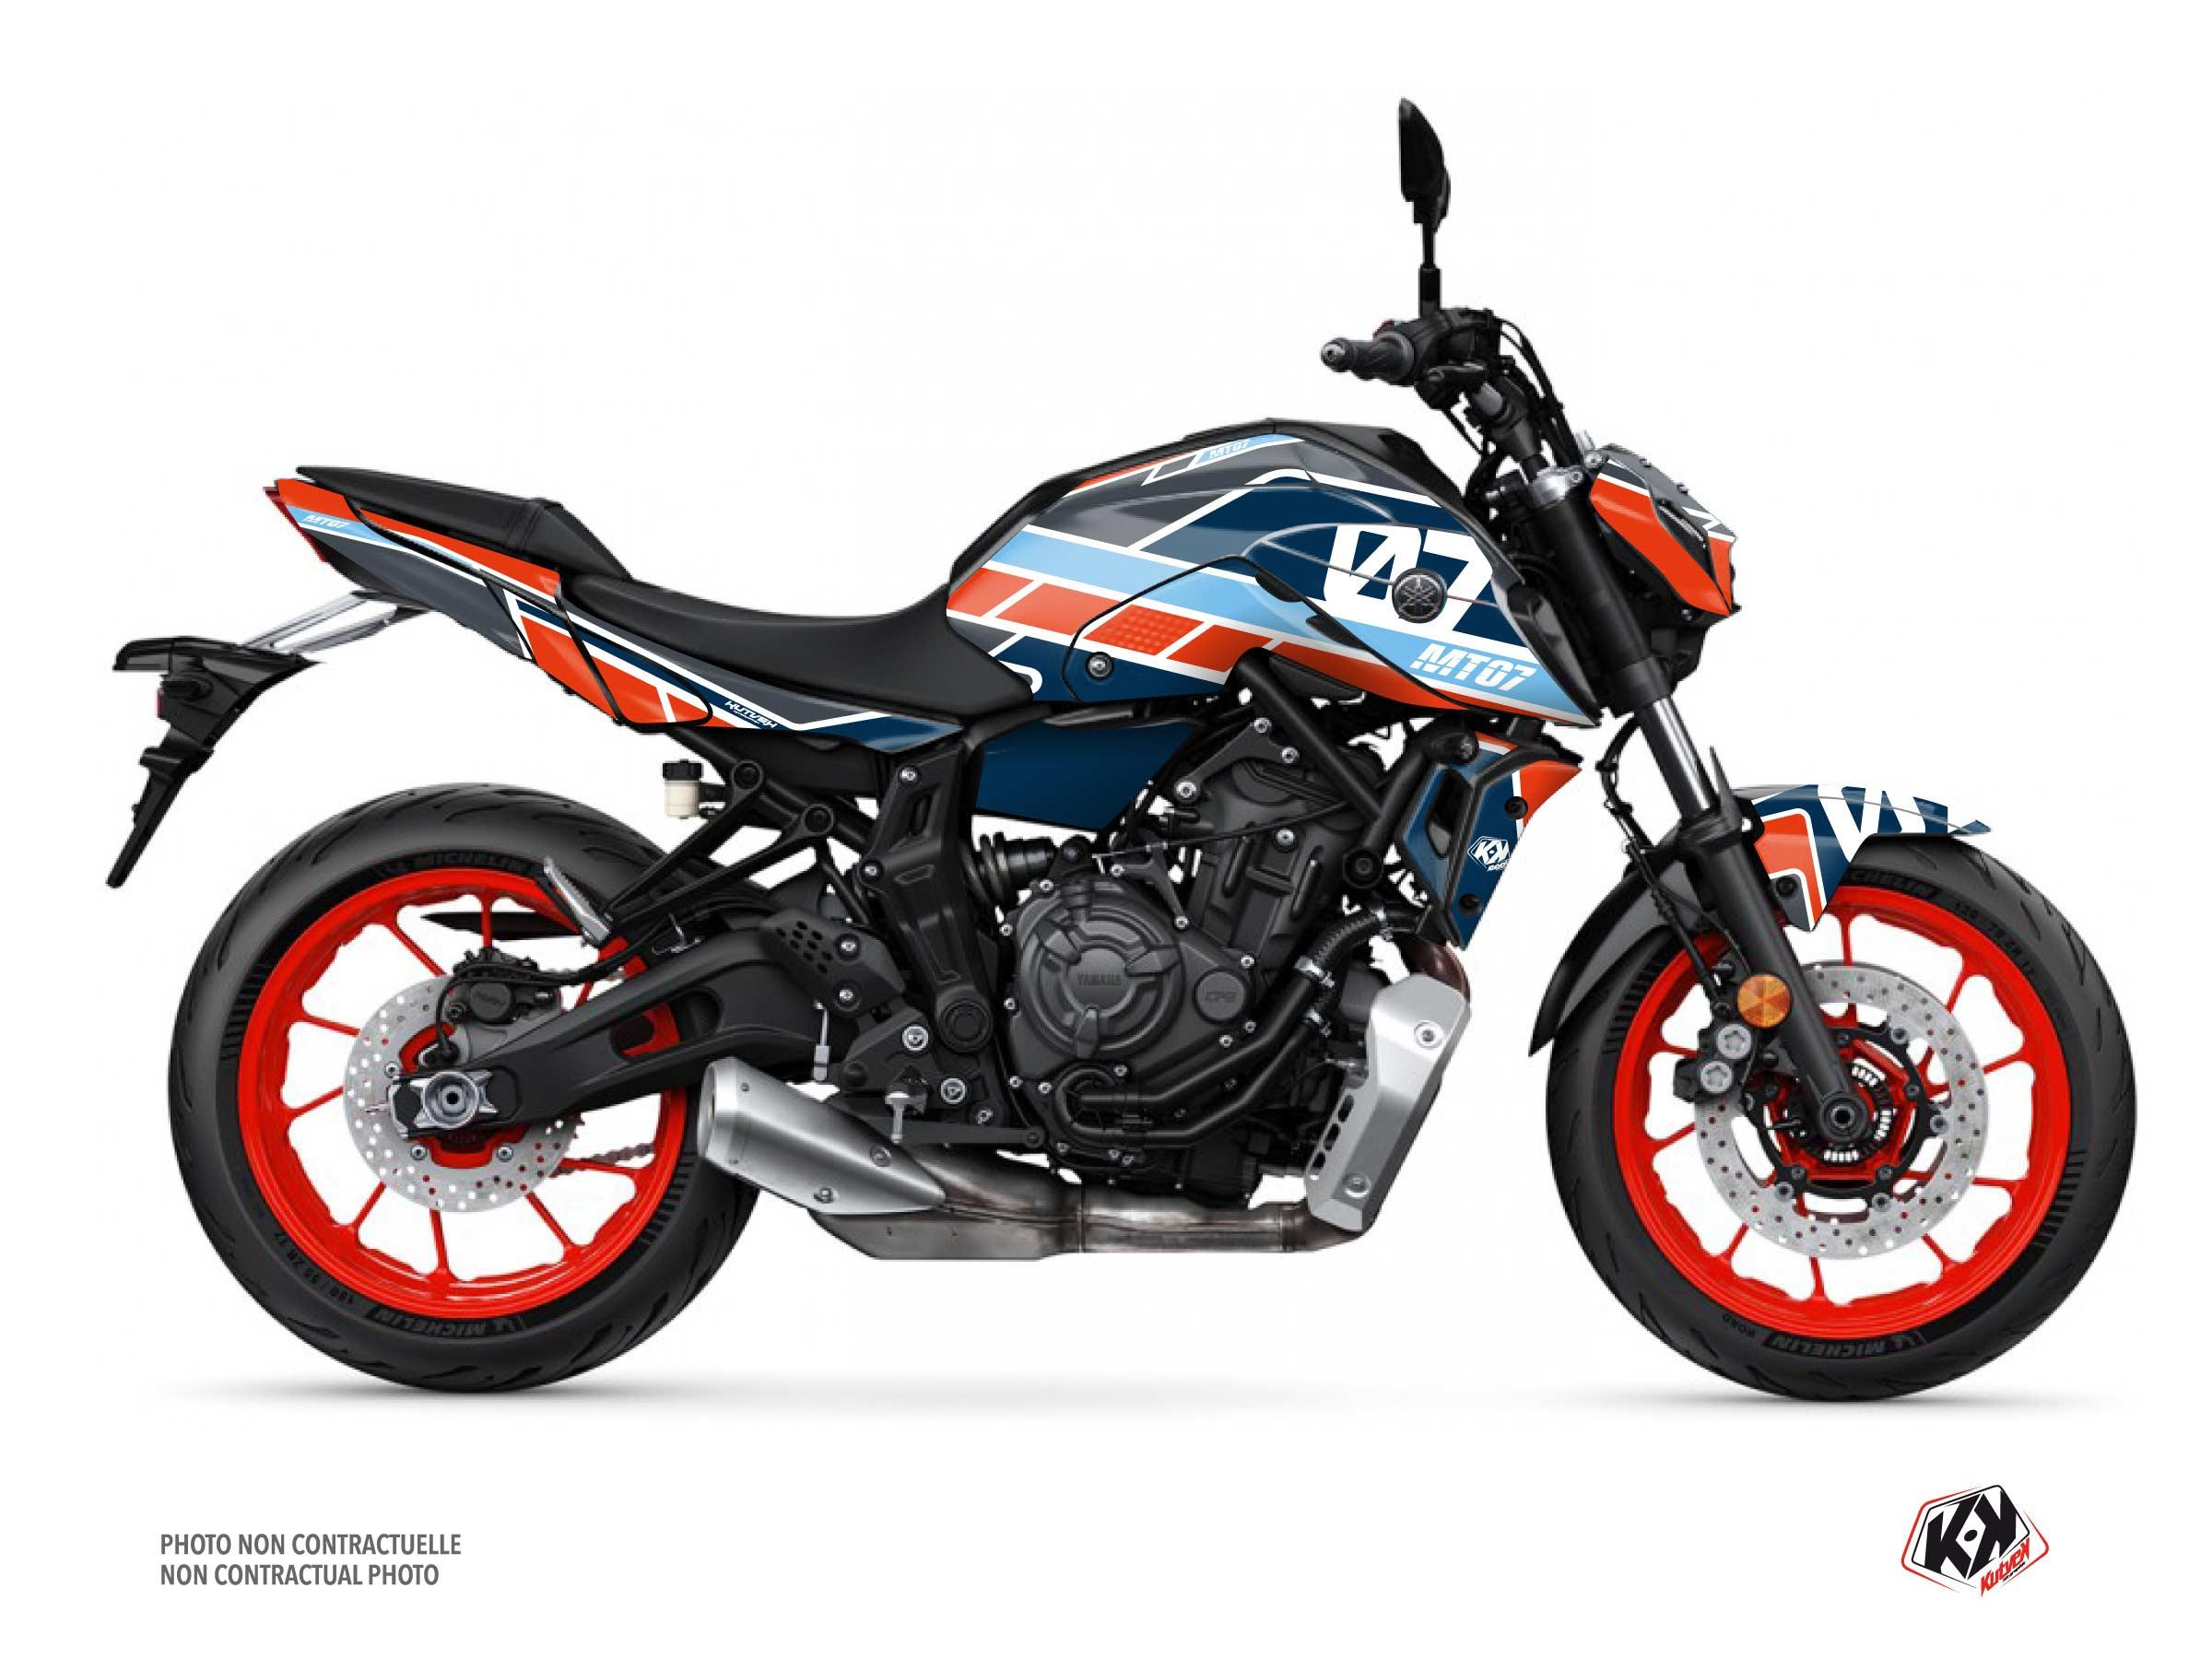 Kit Déco Moto Player Yamaha MT 07 Gris